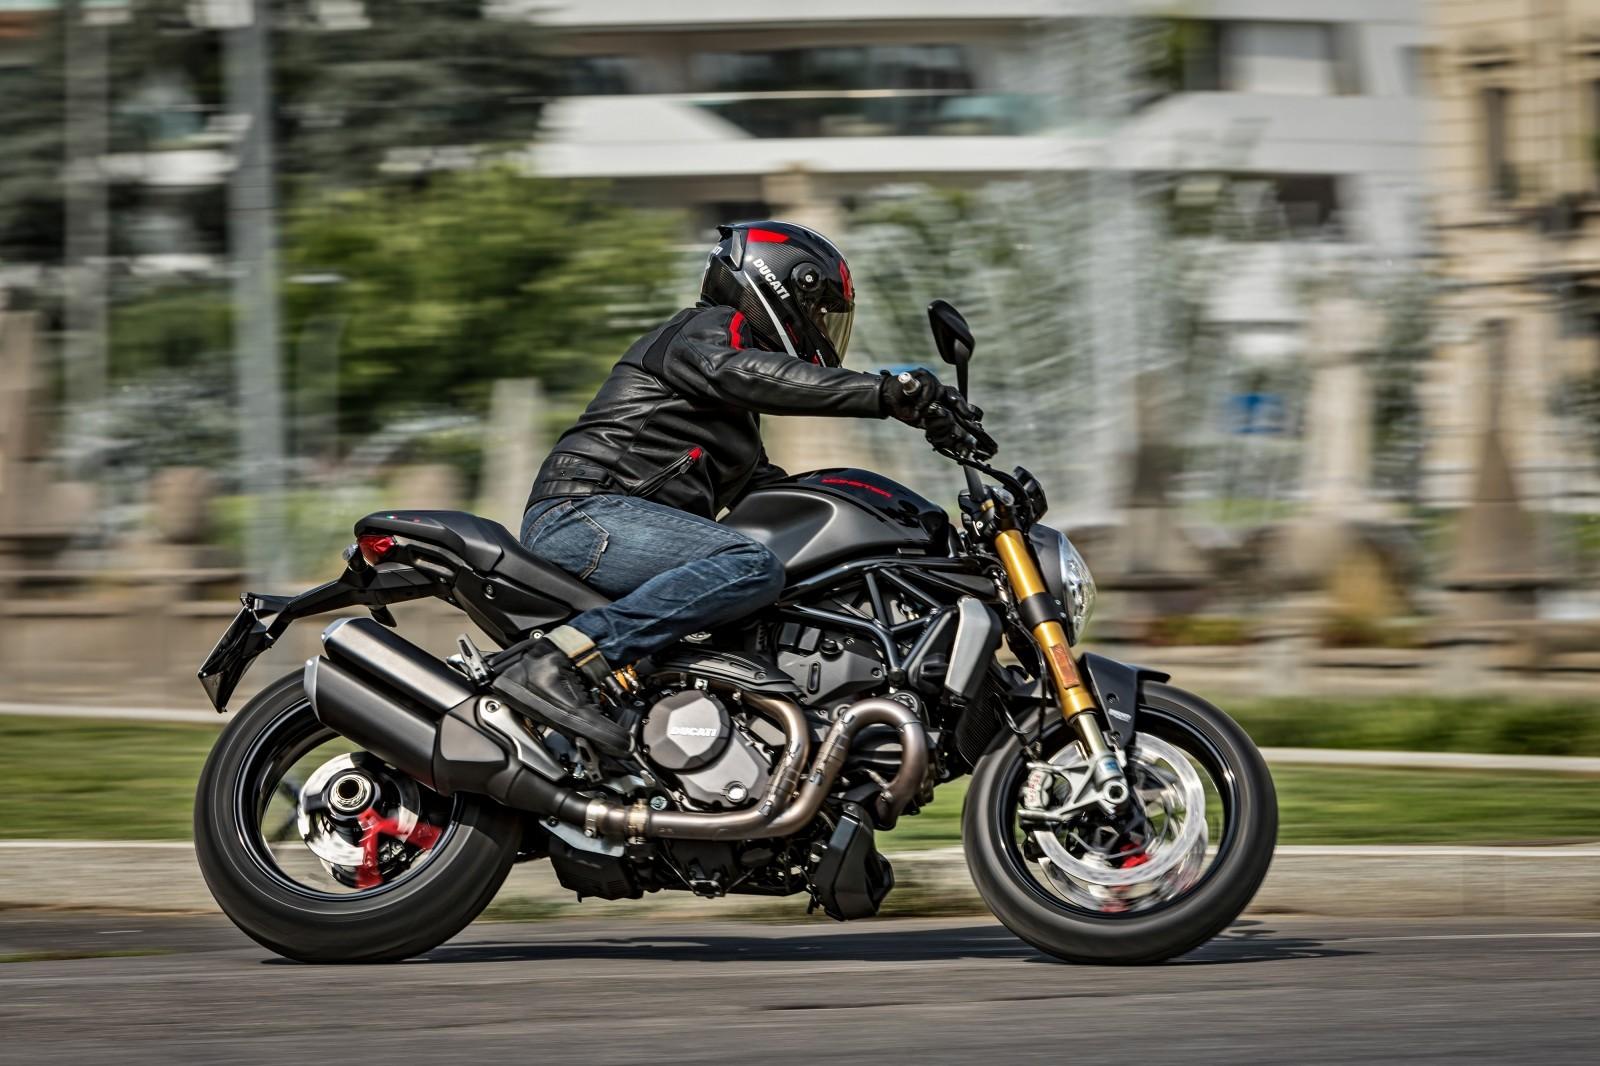 Foto de Ducati Monster 1200 S 2020 color negro (64/68)